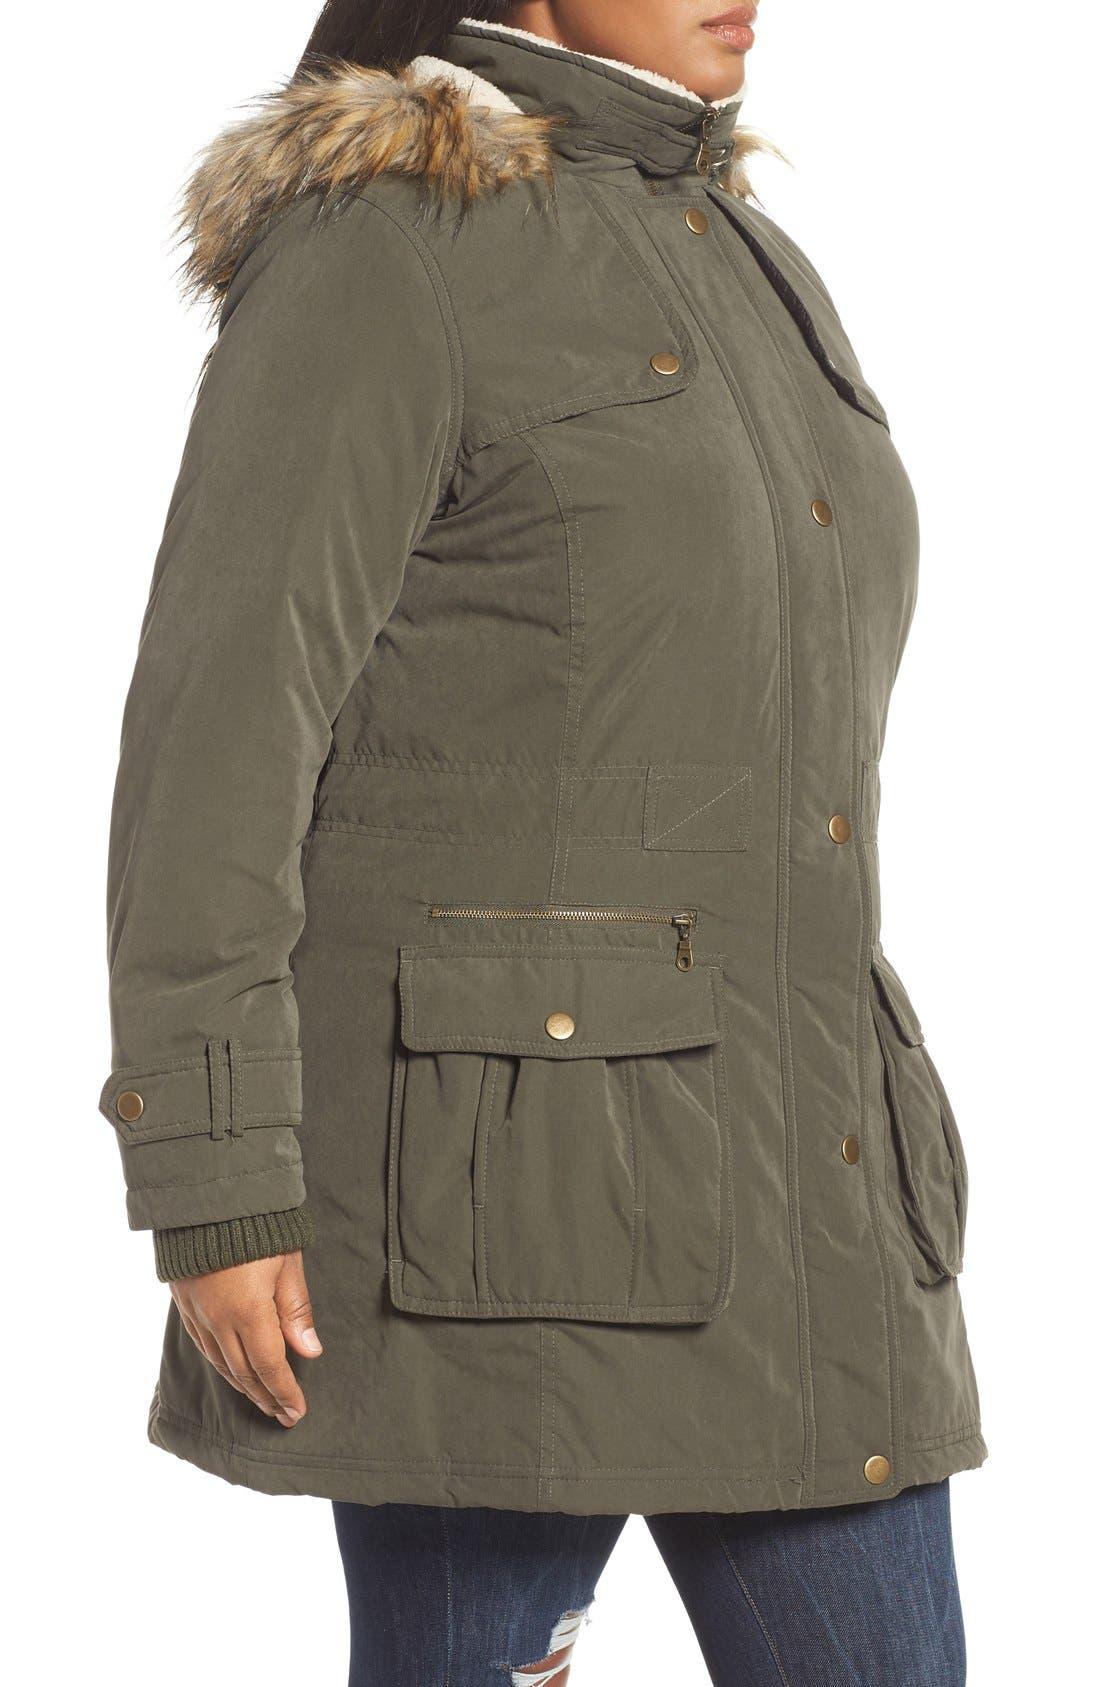 Alternate Image 3  - Halogen® Hooded Parka with Faux Fur Trim (Plus Size)